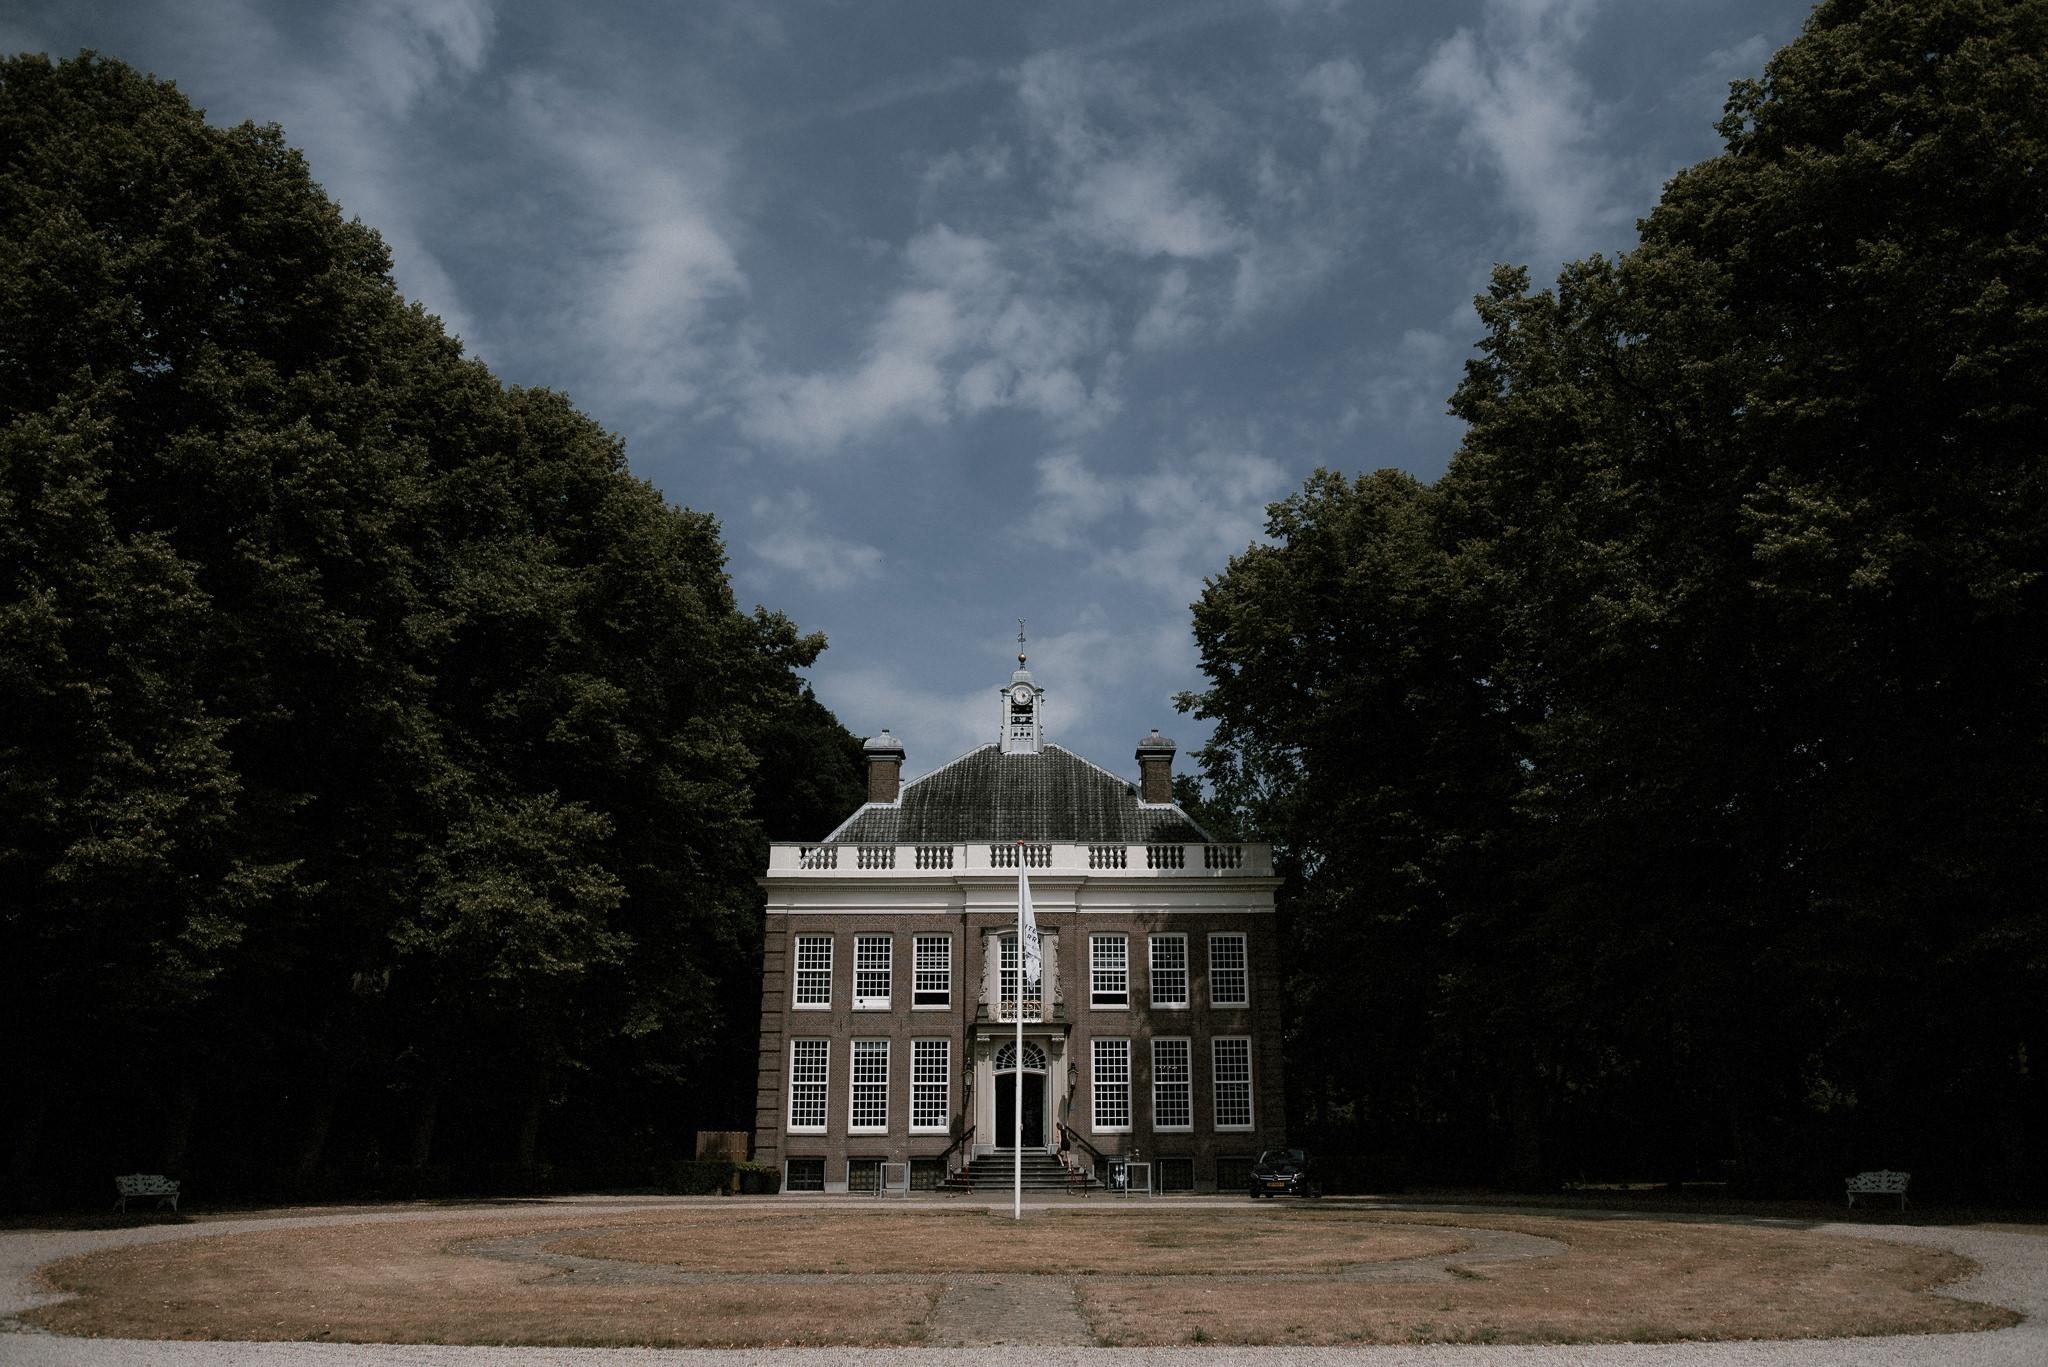 Bruidsfotografie Buitenplaats Sparrendaal - Naomi van der Kraan 0002.jpg